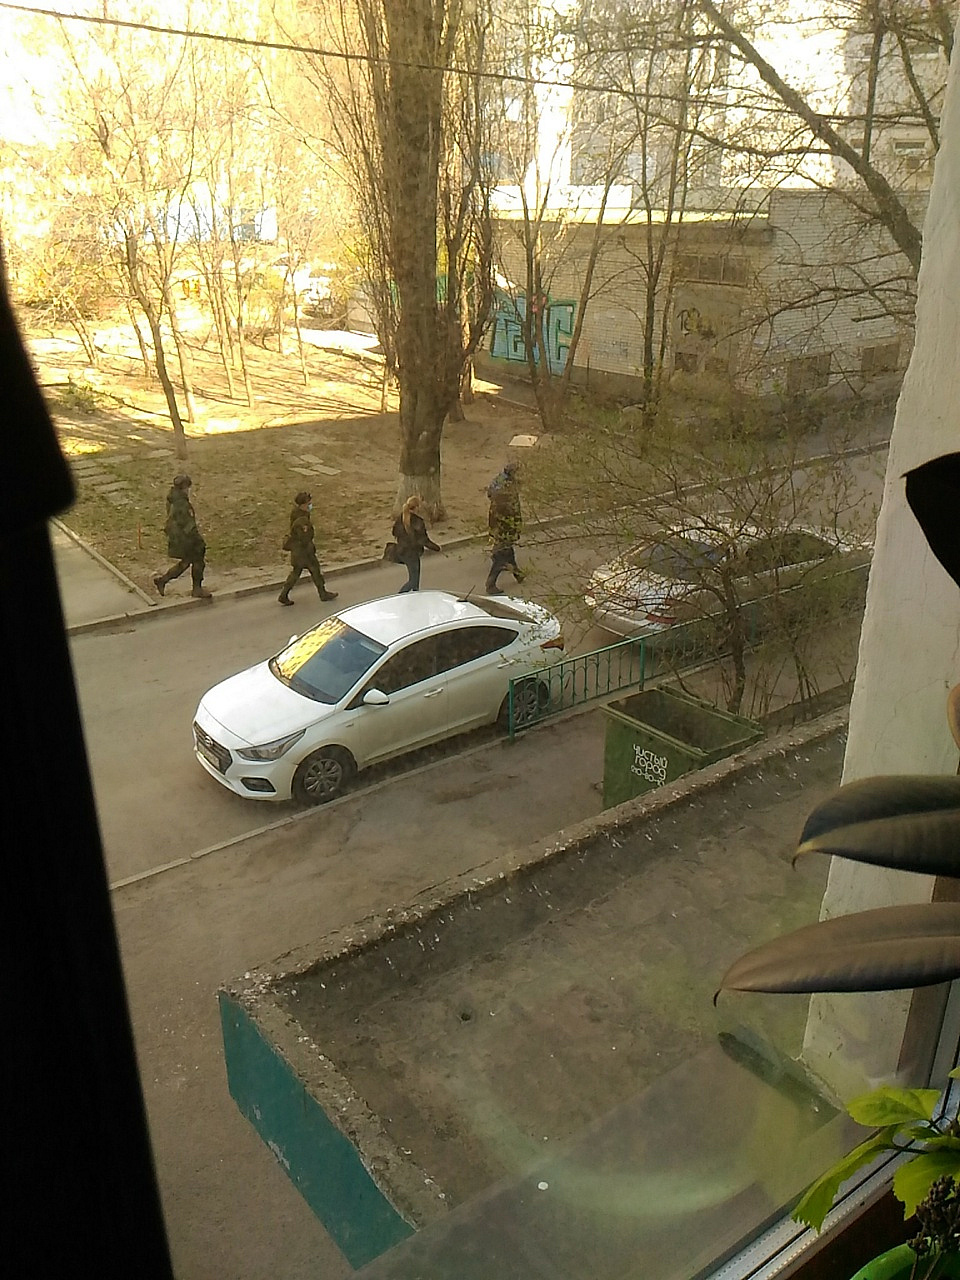 https://big-rostov.ru/wp-content/uploads/2020/04/patrul.jpeg